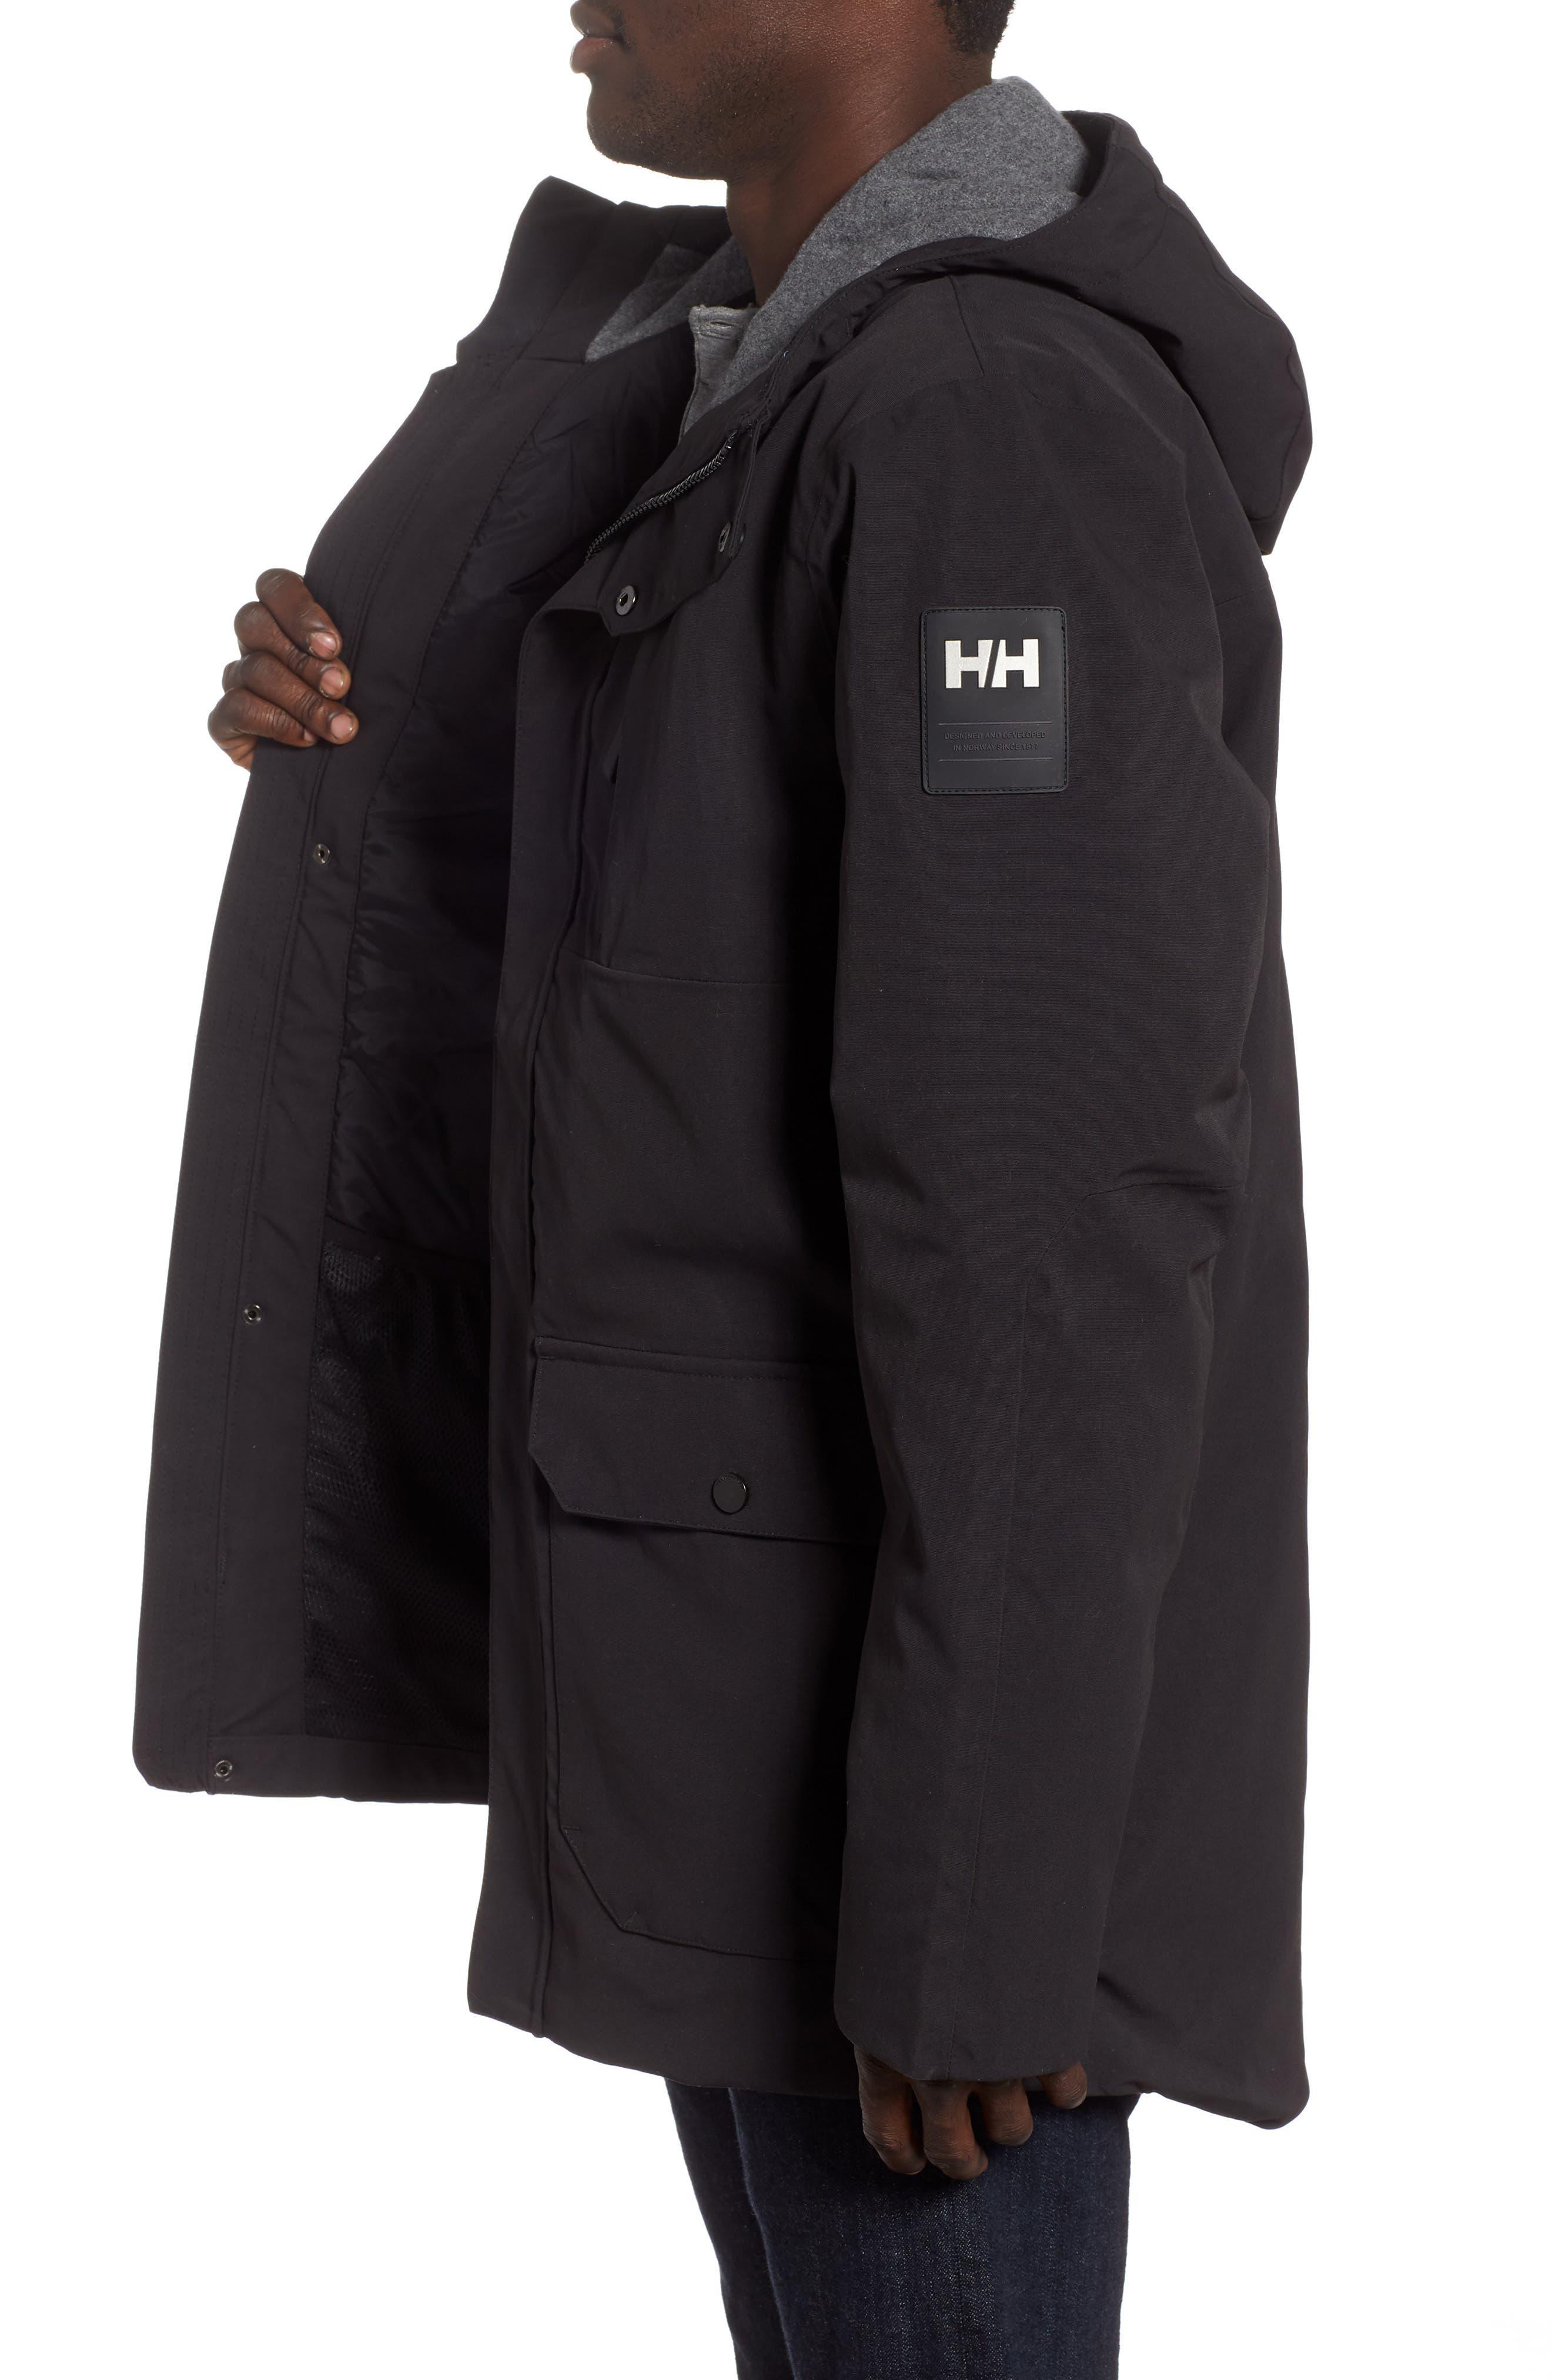 Urban Windproof & Waterproof Primaloft<sup>®</sup> Long Jacket,                             Alternate thumbnail 3, color,                             BLACK